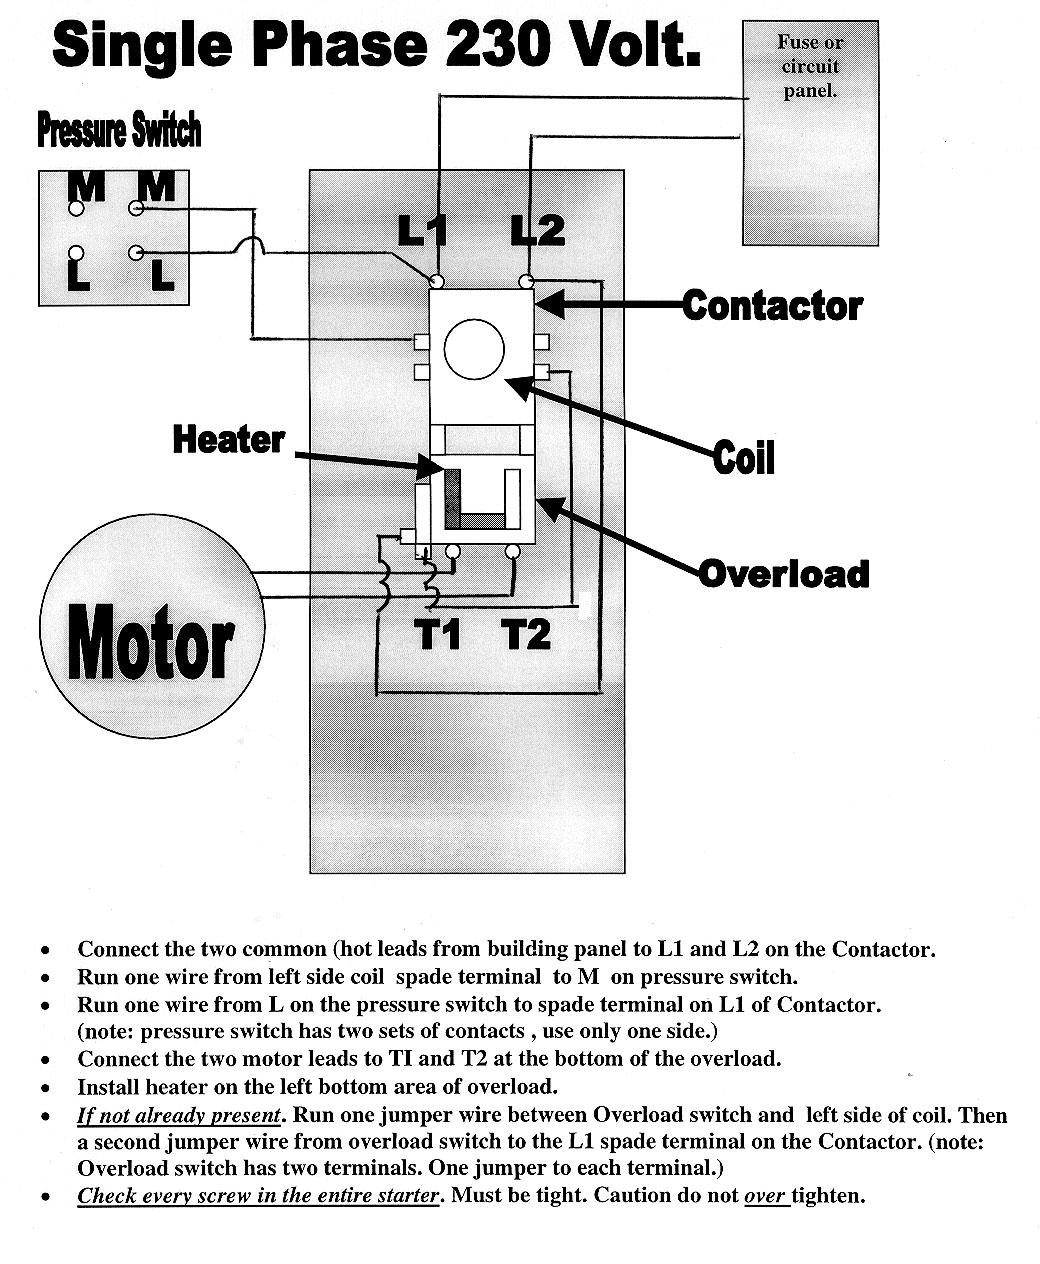 weg 3 phase motor wiring diagram corsa c handbrake cable single marathon gallery | sample